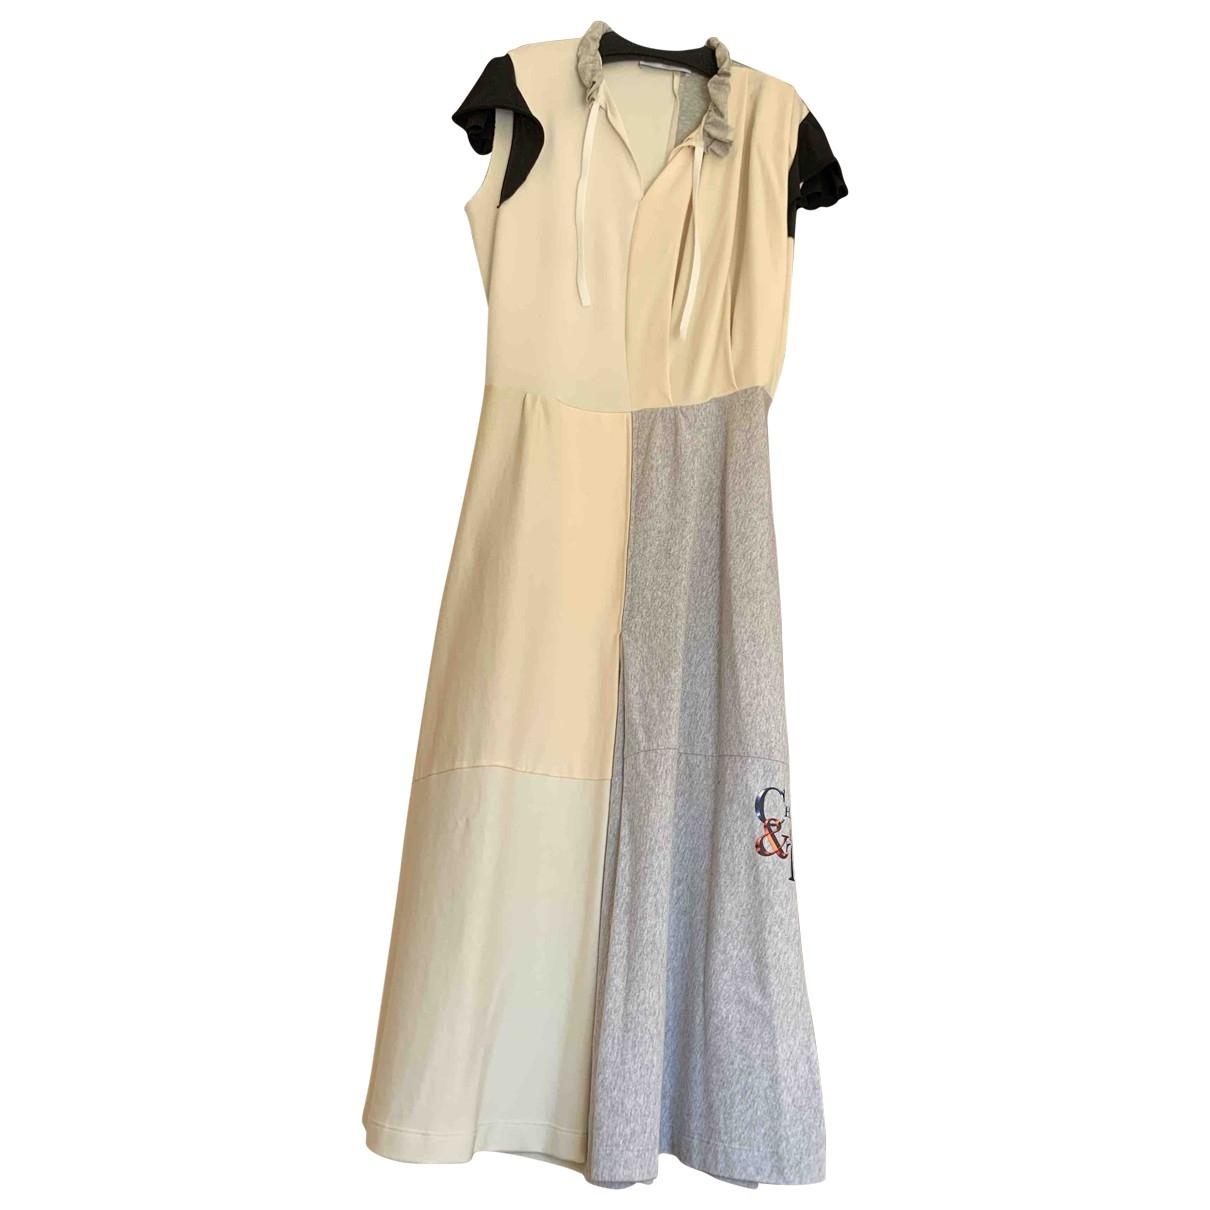 Balenciaga \N Kleid in  Beige Baumwolle